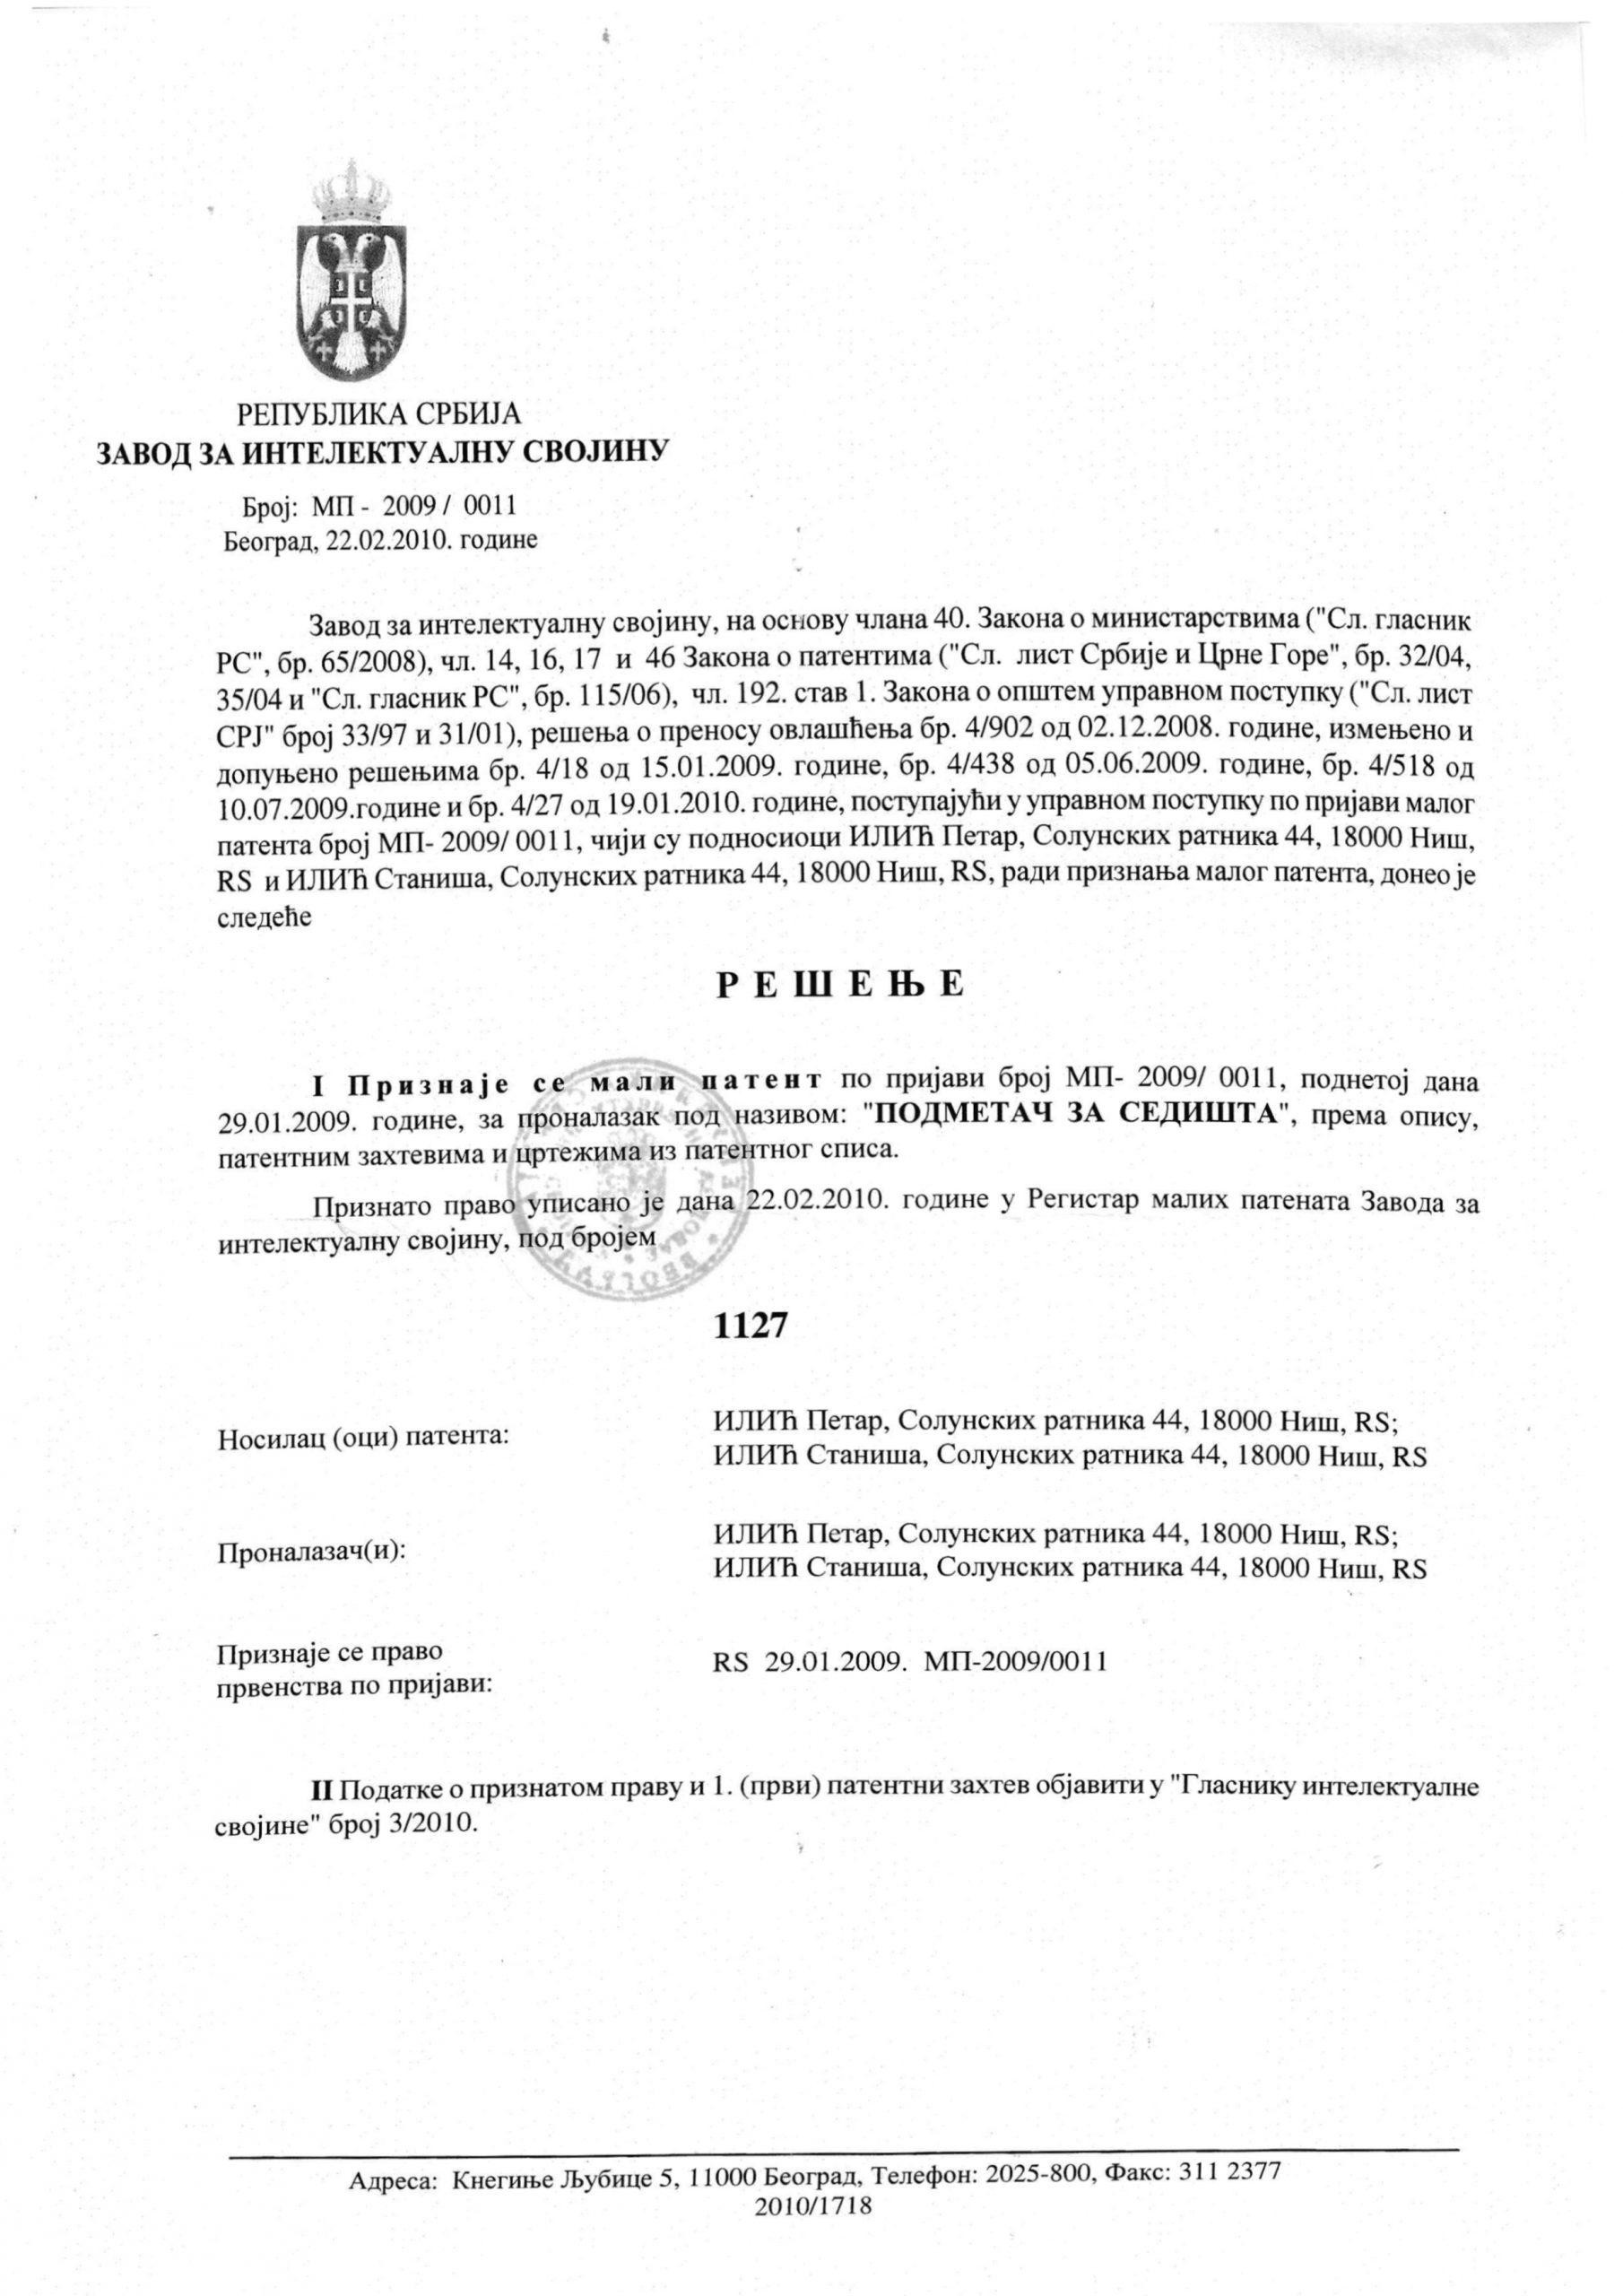 Corona Ergo patenti - podmetac za sedista 2